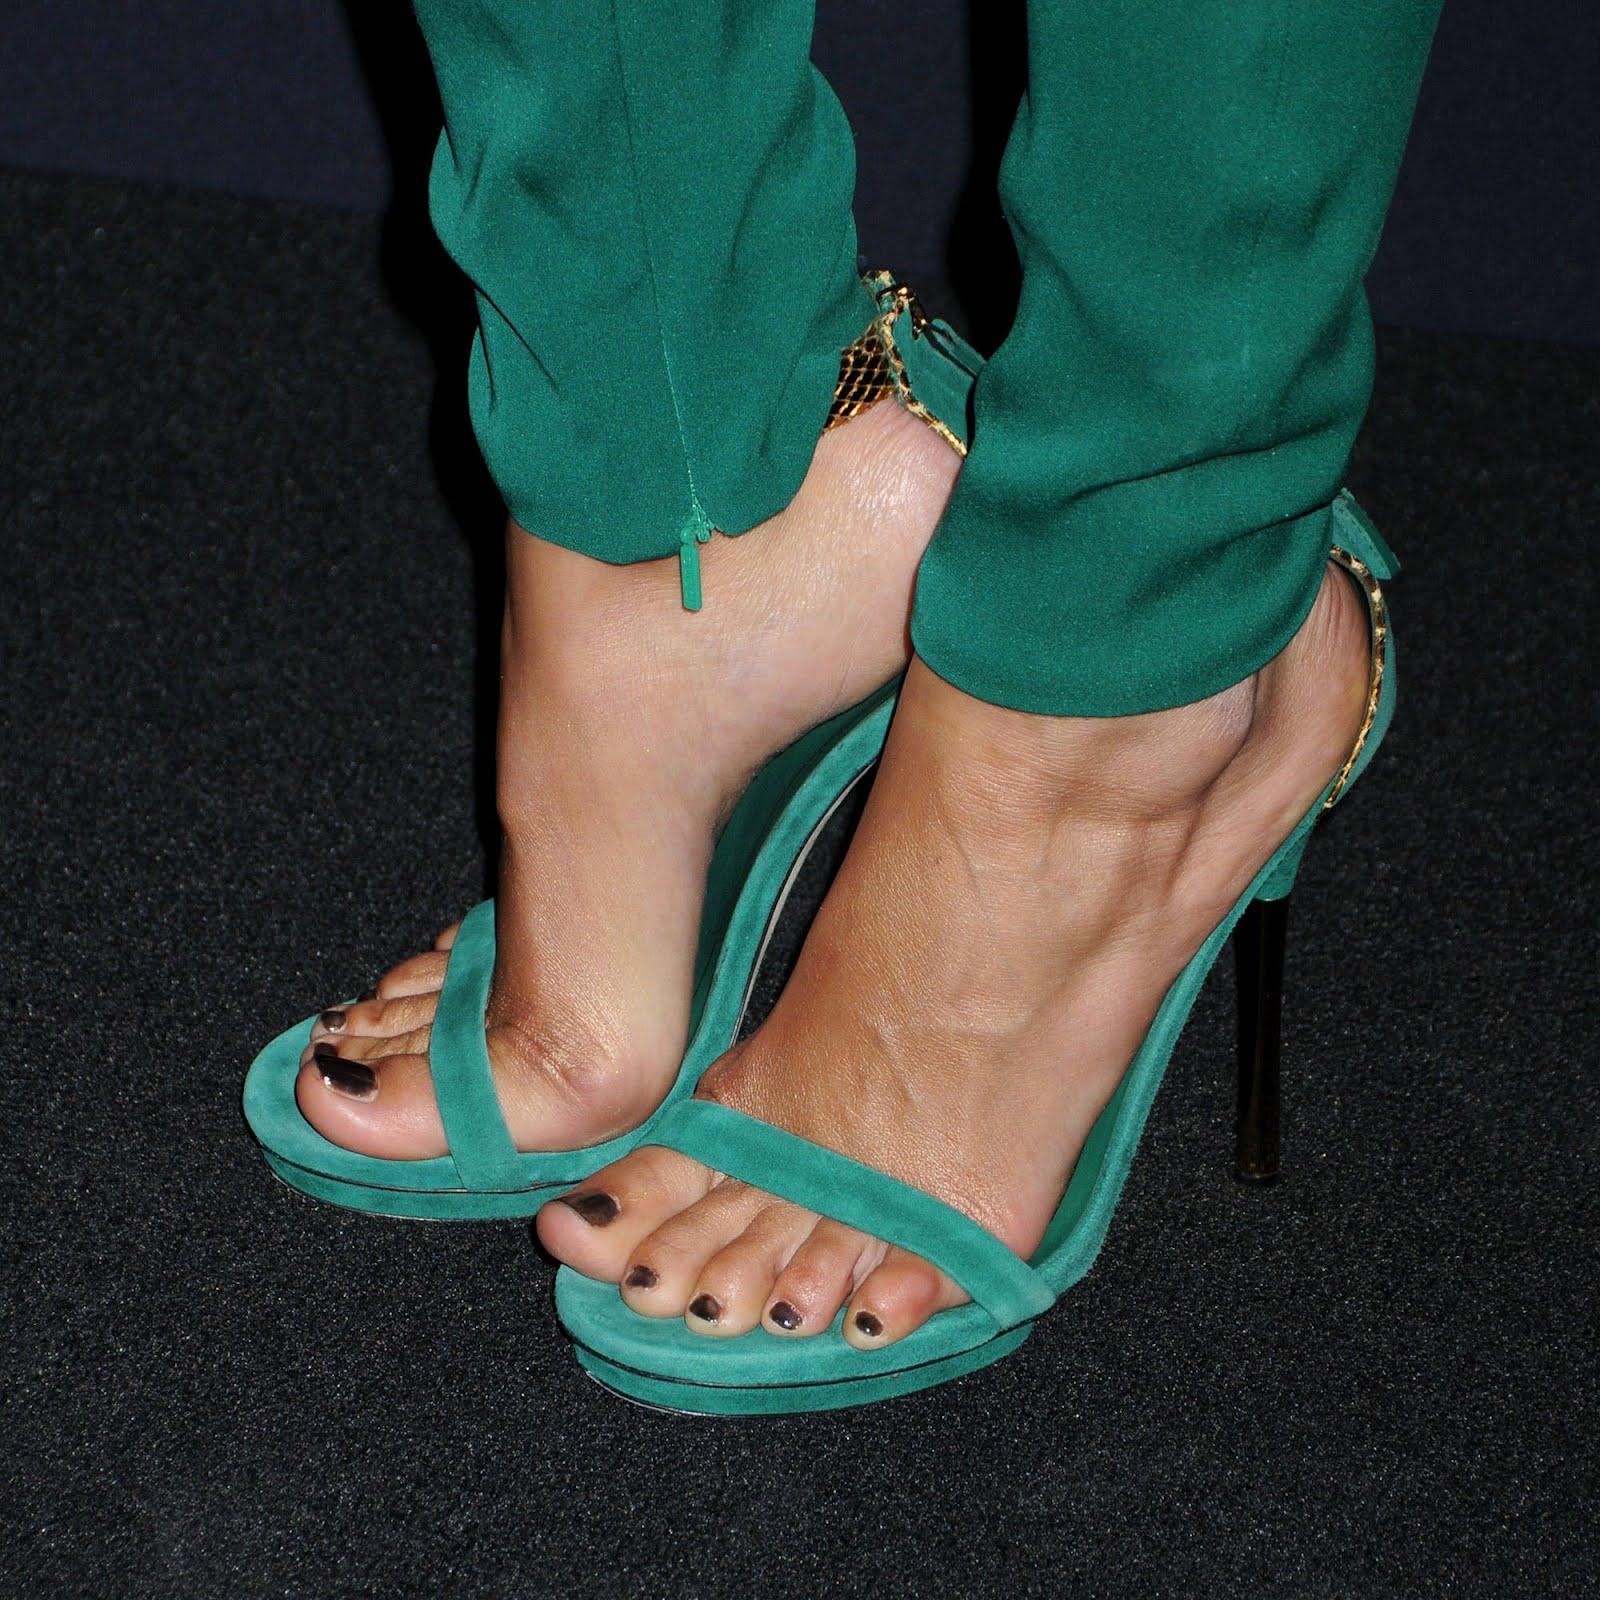 Feet Camilla Belle naked (38 photo), Tits, Sideboobs, Feet, braless 2006